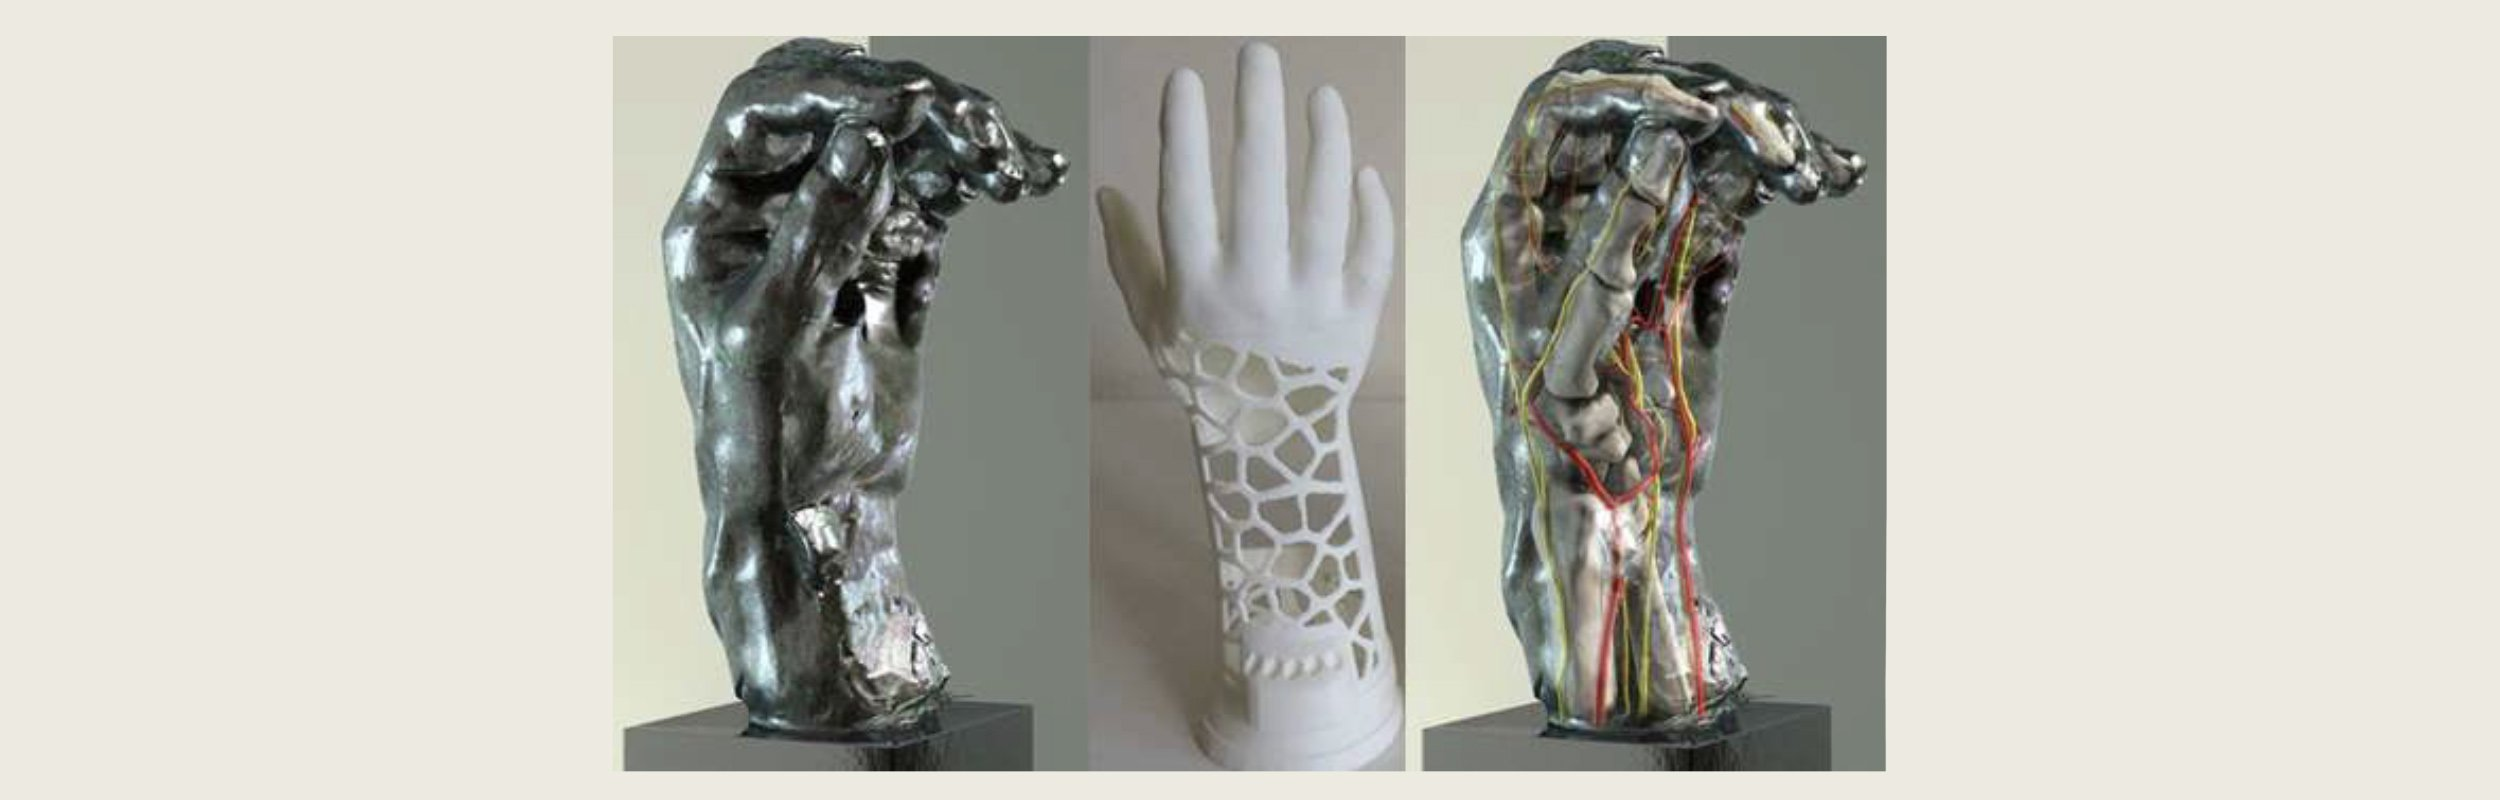 Tecnologia digitale 3D e medicina, incontro con Francesca Uccheddu